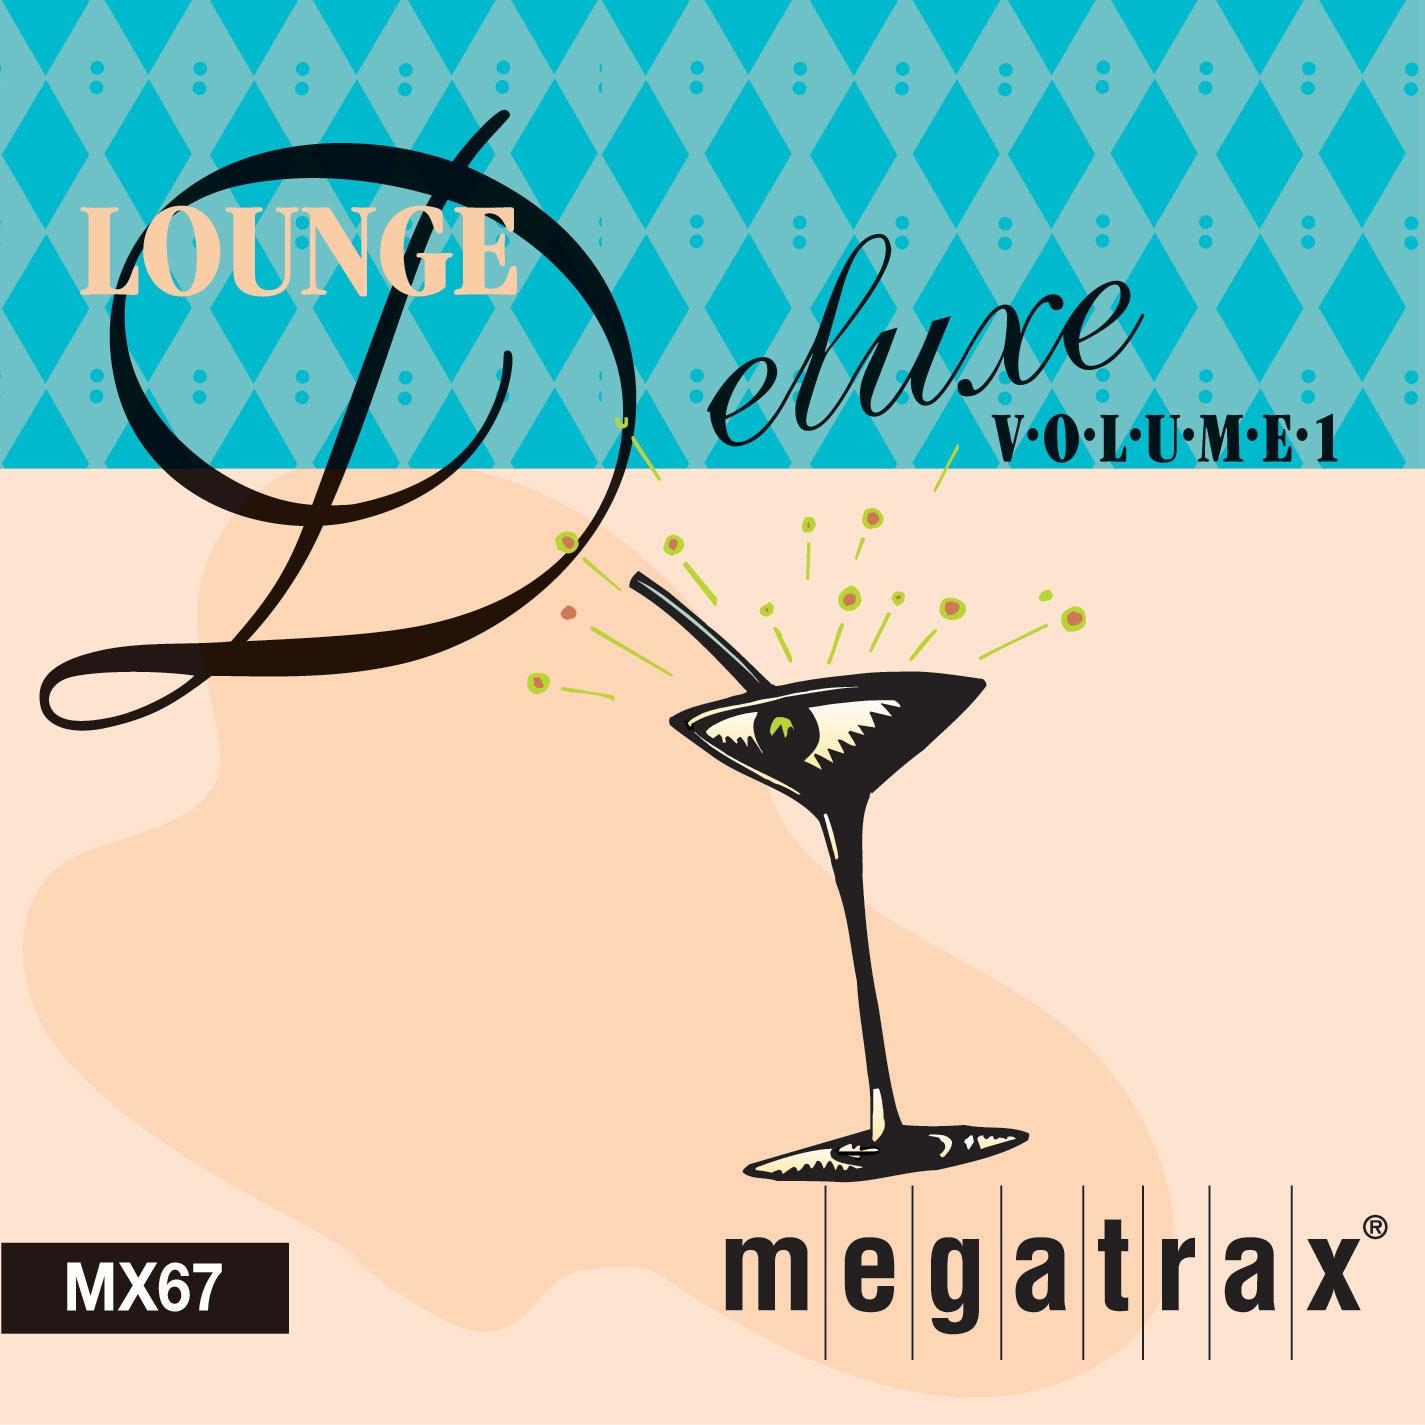 Lounge Deluxe Vol. 1